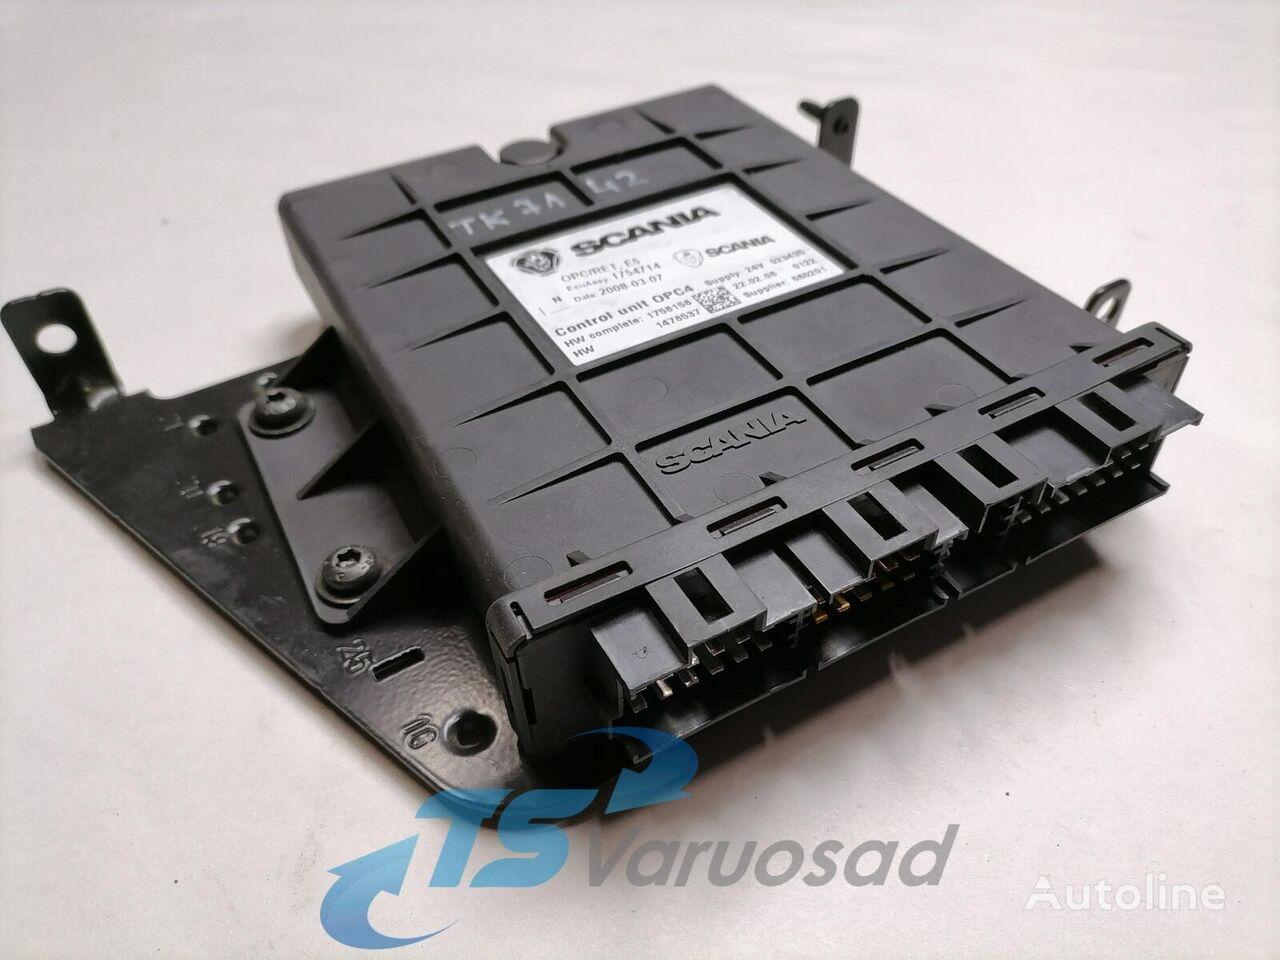 SCANIA juhtplokk, käigukast ECU, OPC4/RET control unit for tractor unit